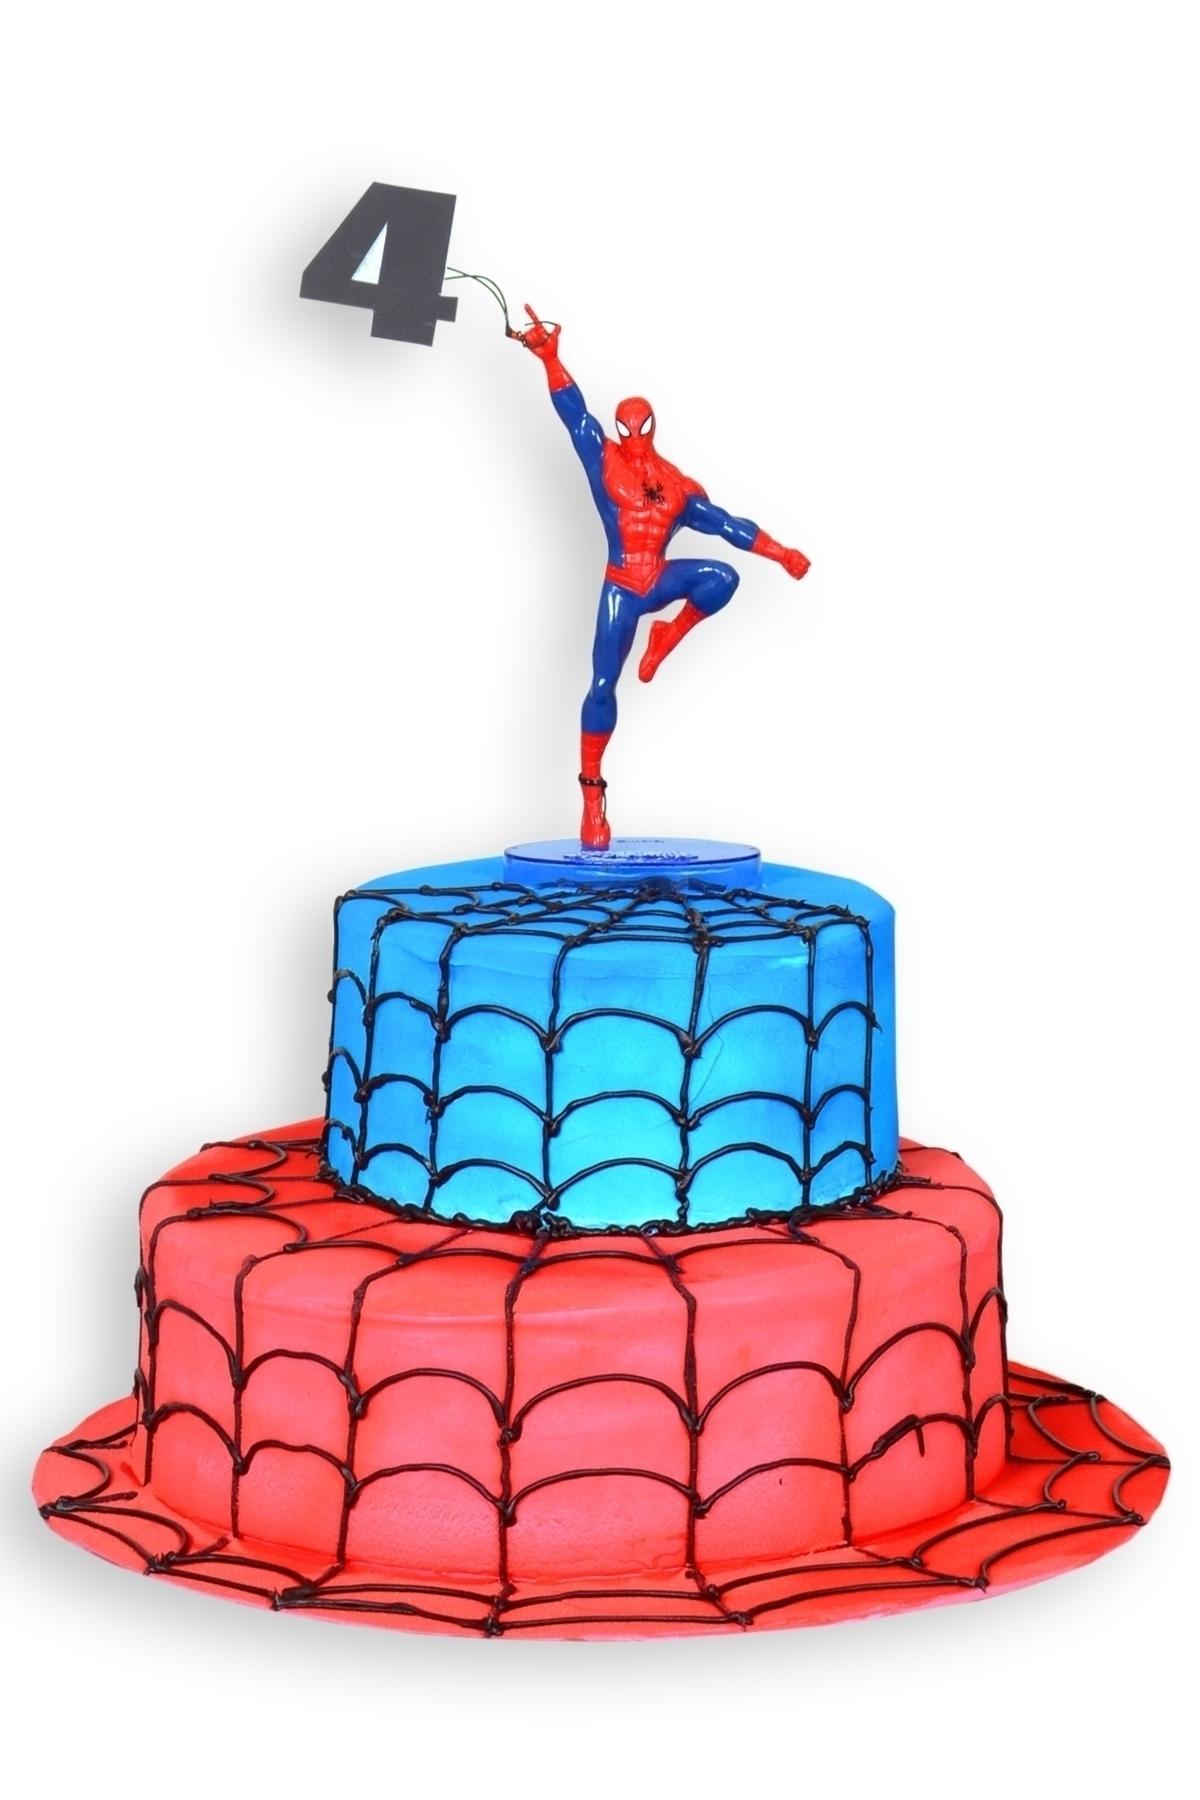 Spider-Man Cake in Pune Designs, Images, Price